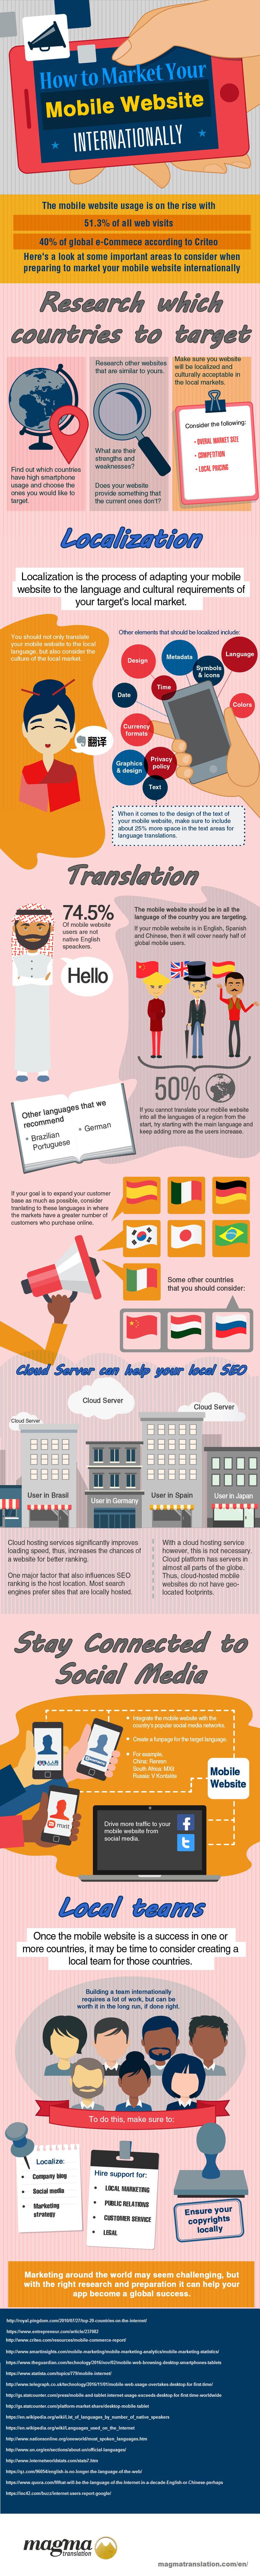 App Marketing Infographic